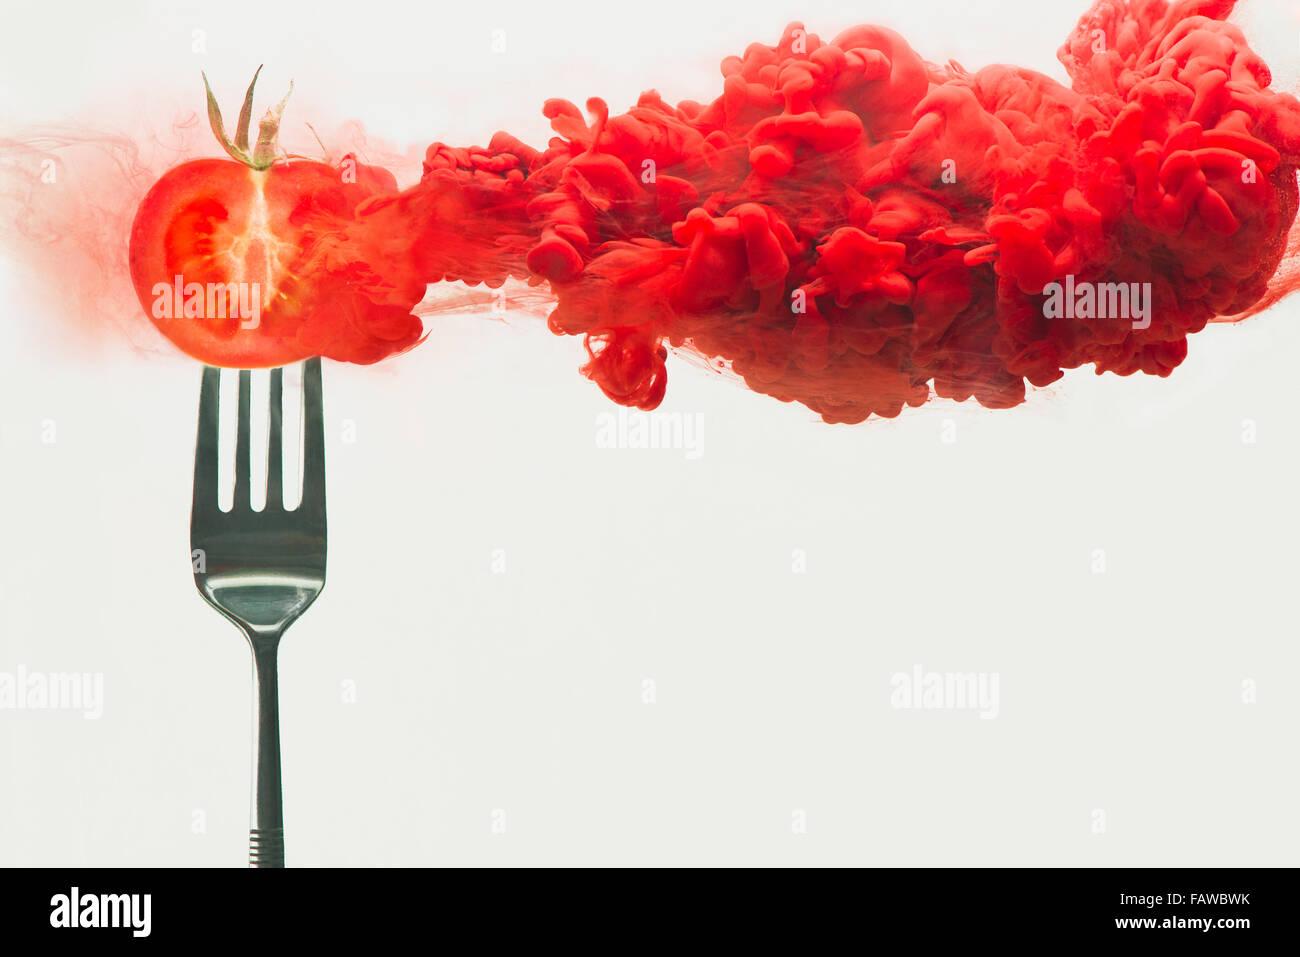 Disintegrated tomato - Stock Image